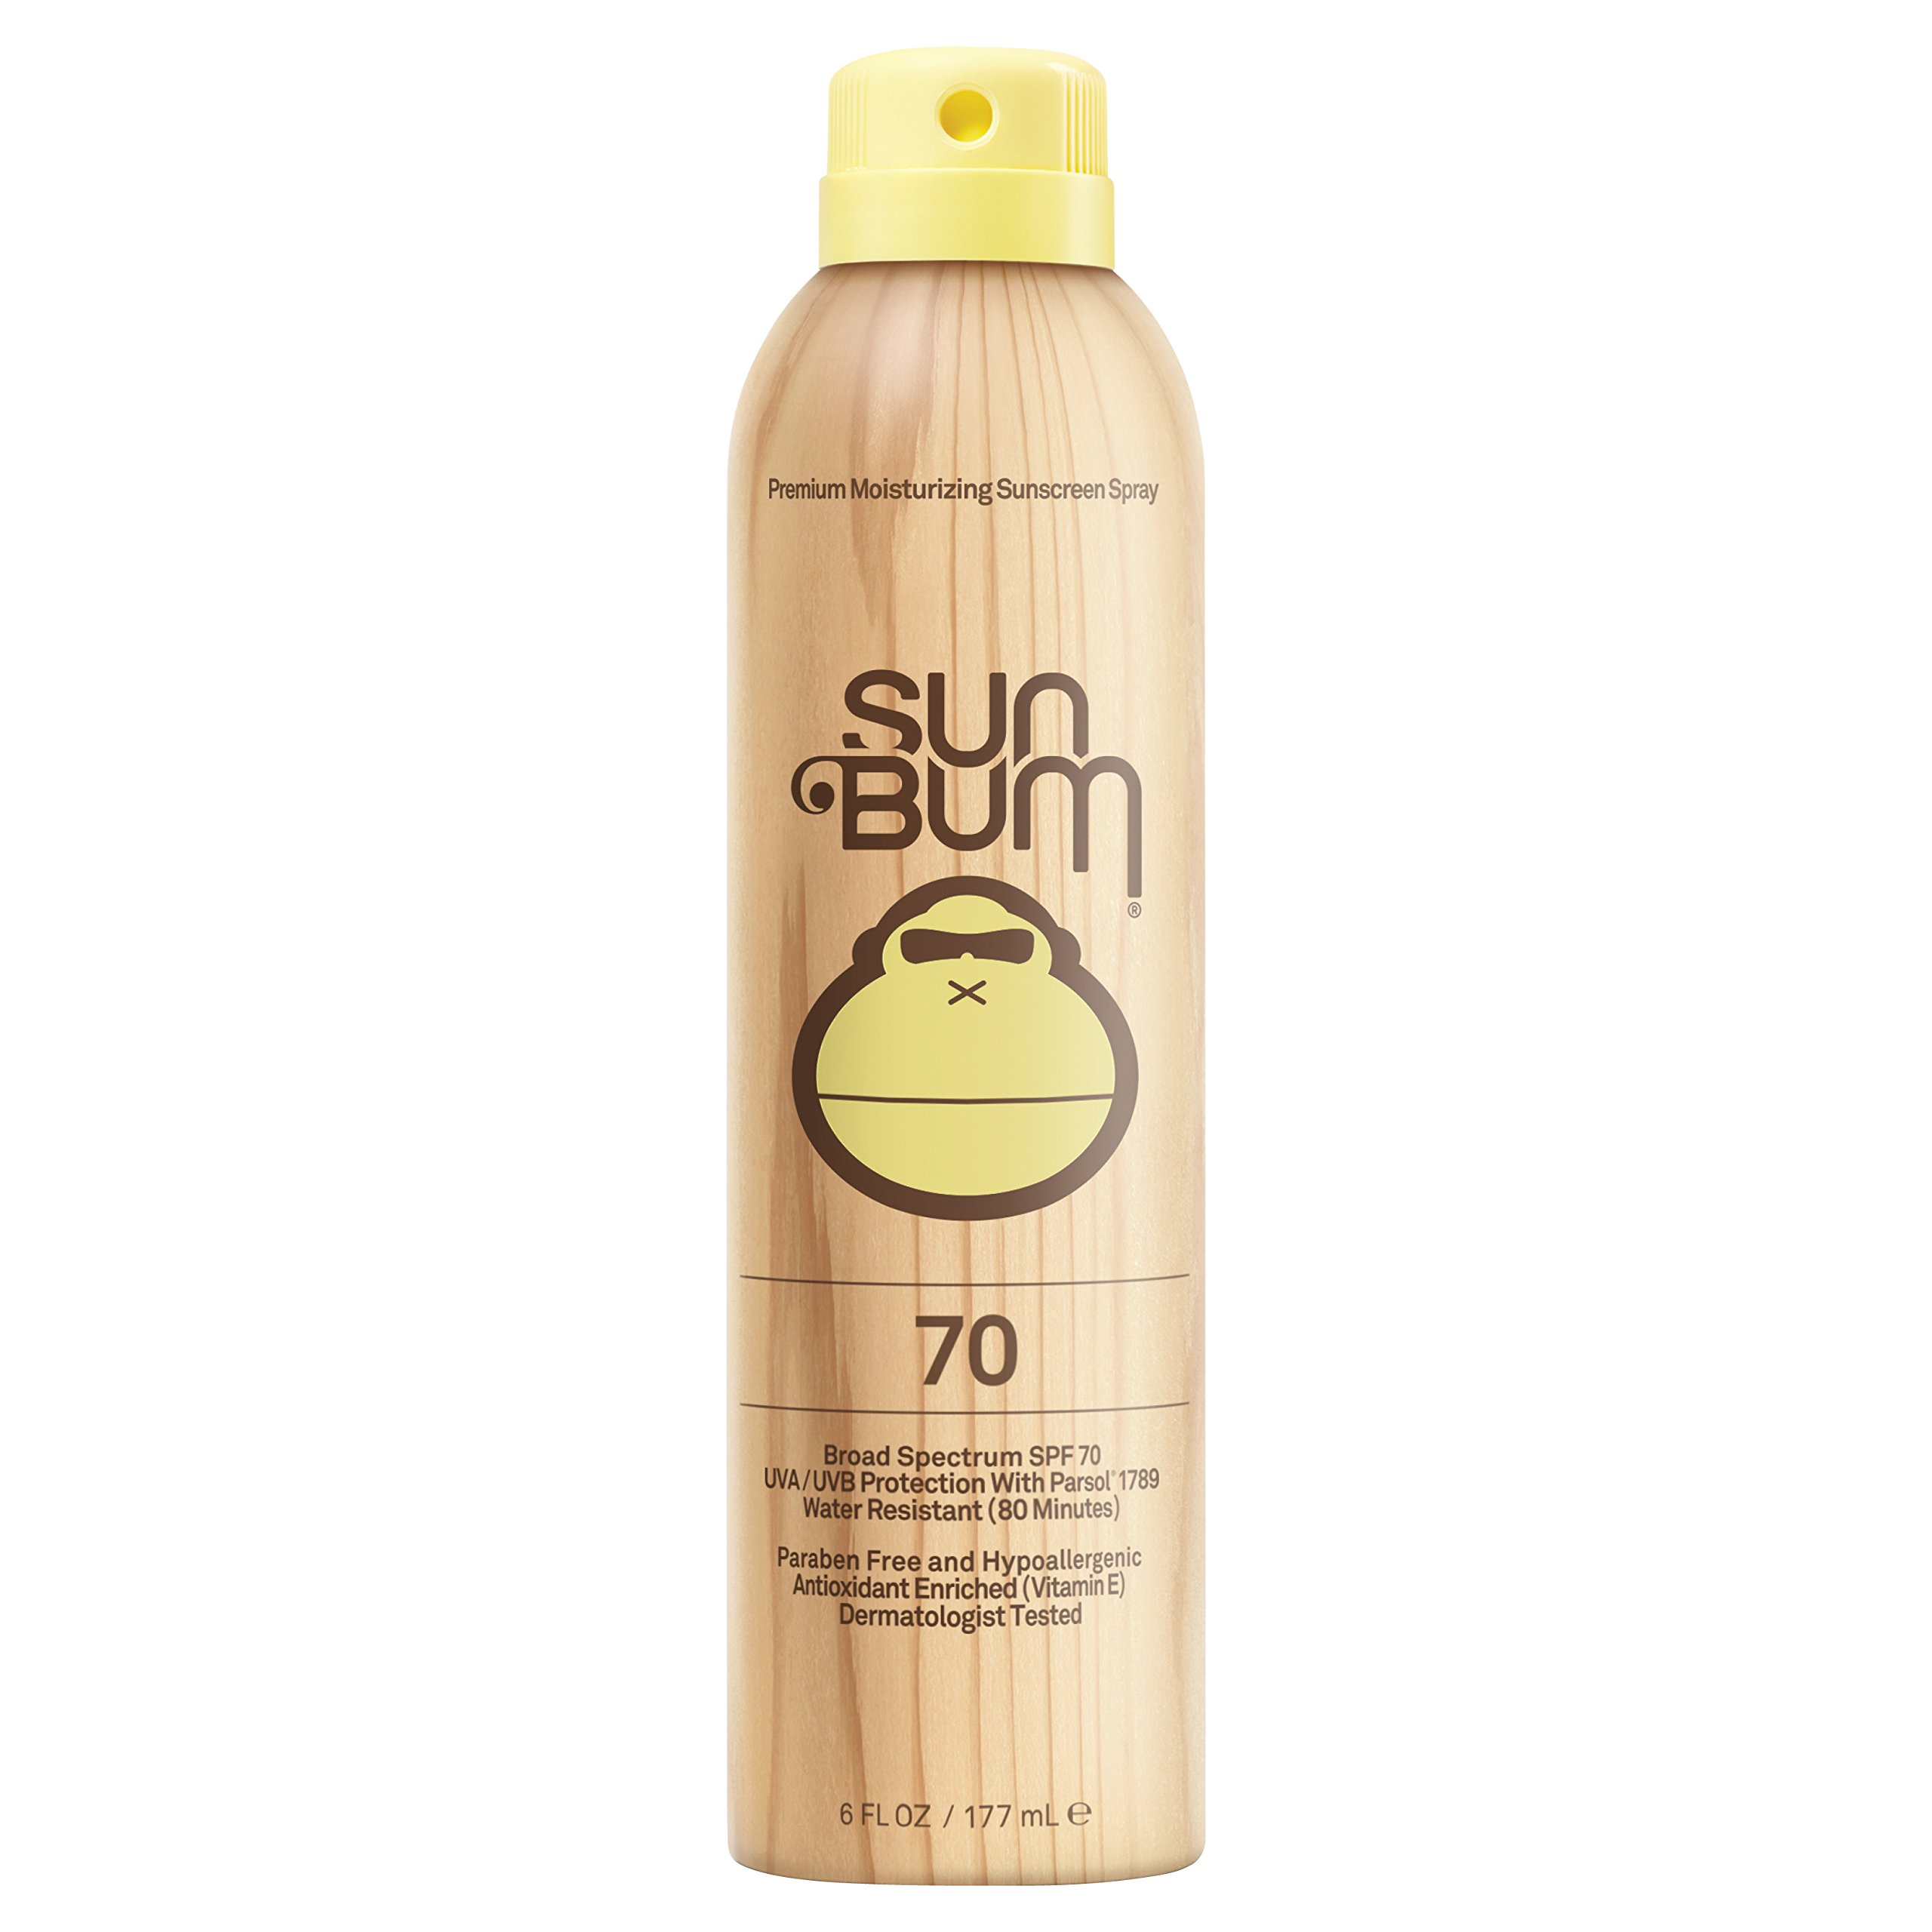 Sun Bum Original Moisturizing Sunscreen Spray, SPF 70, 6 oz Bottle, 1 Count, Broad Spectrum UVA/UVB Protection, Hypoallergenic, Paraben Free, Gluten Free